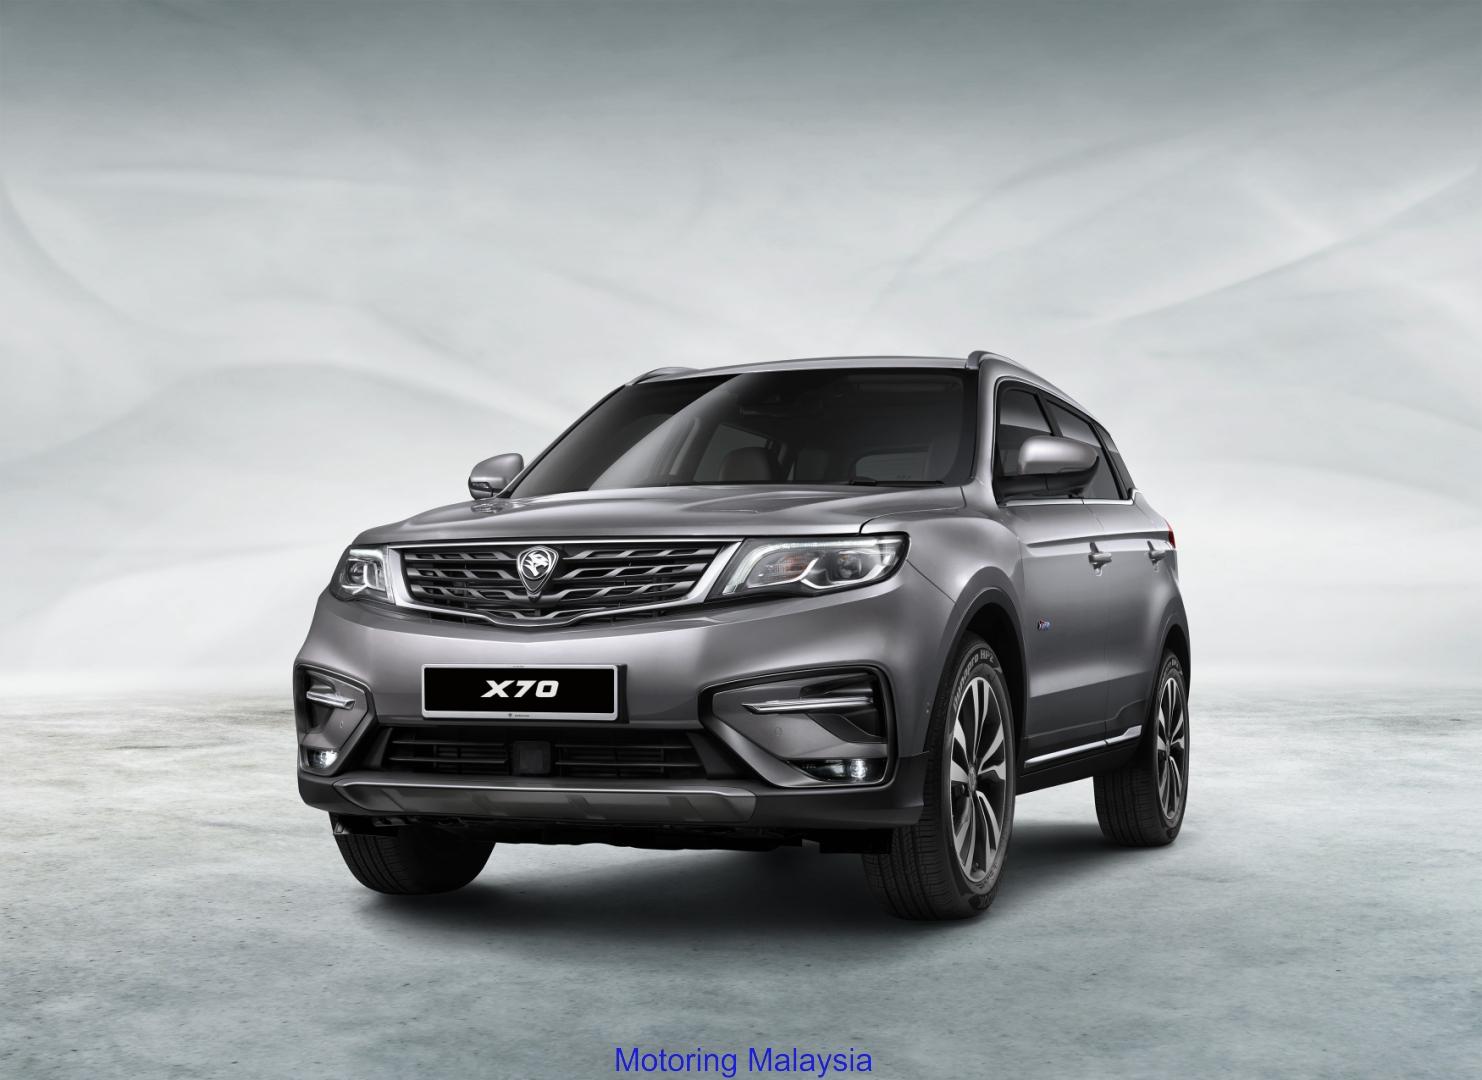 Motoring Malaysia Proton Previews Their Latest Car The